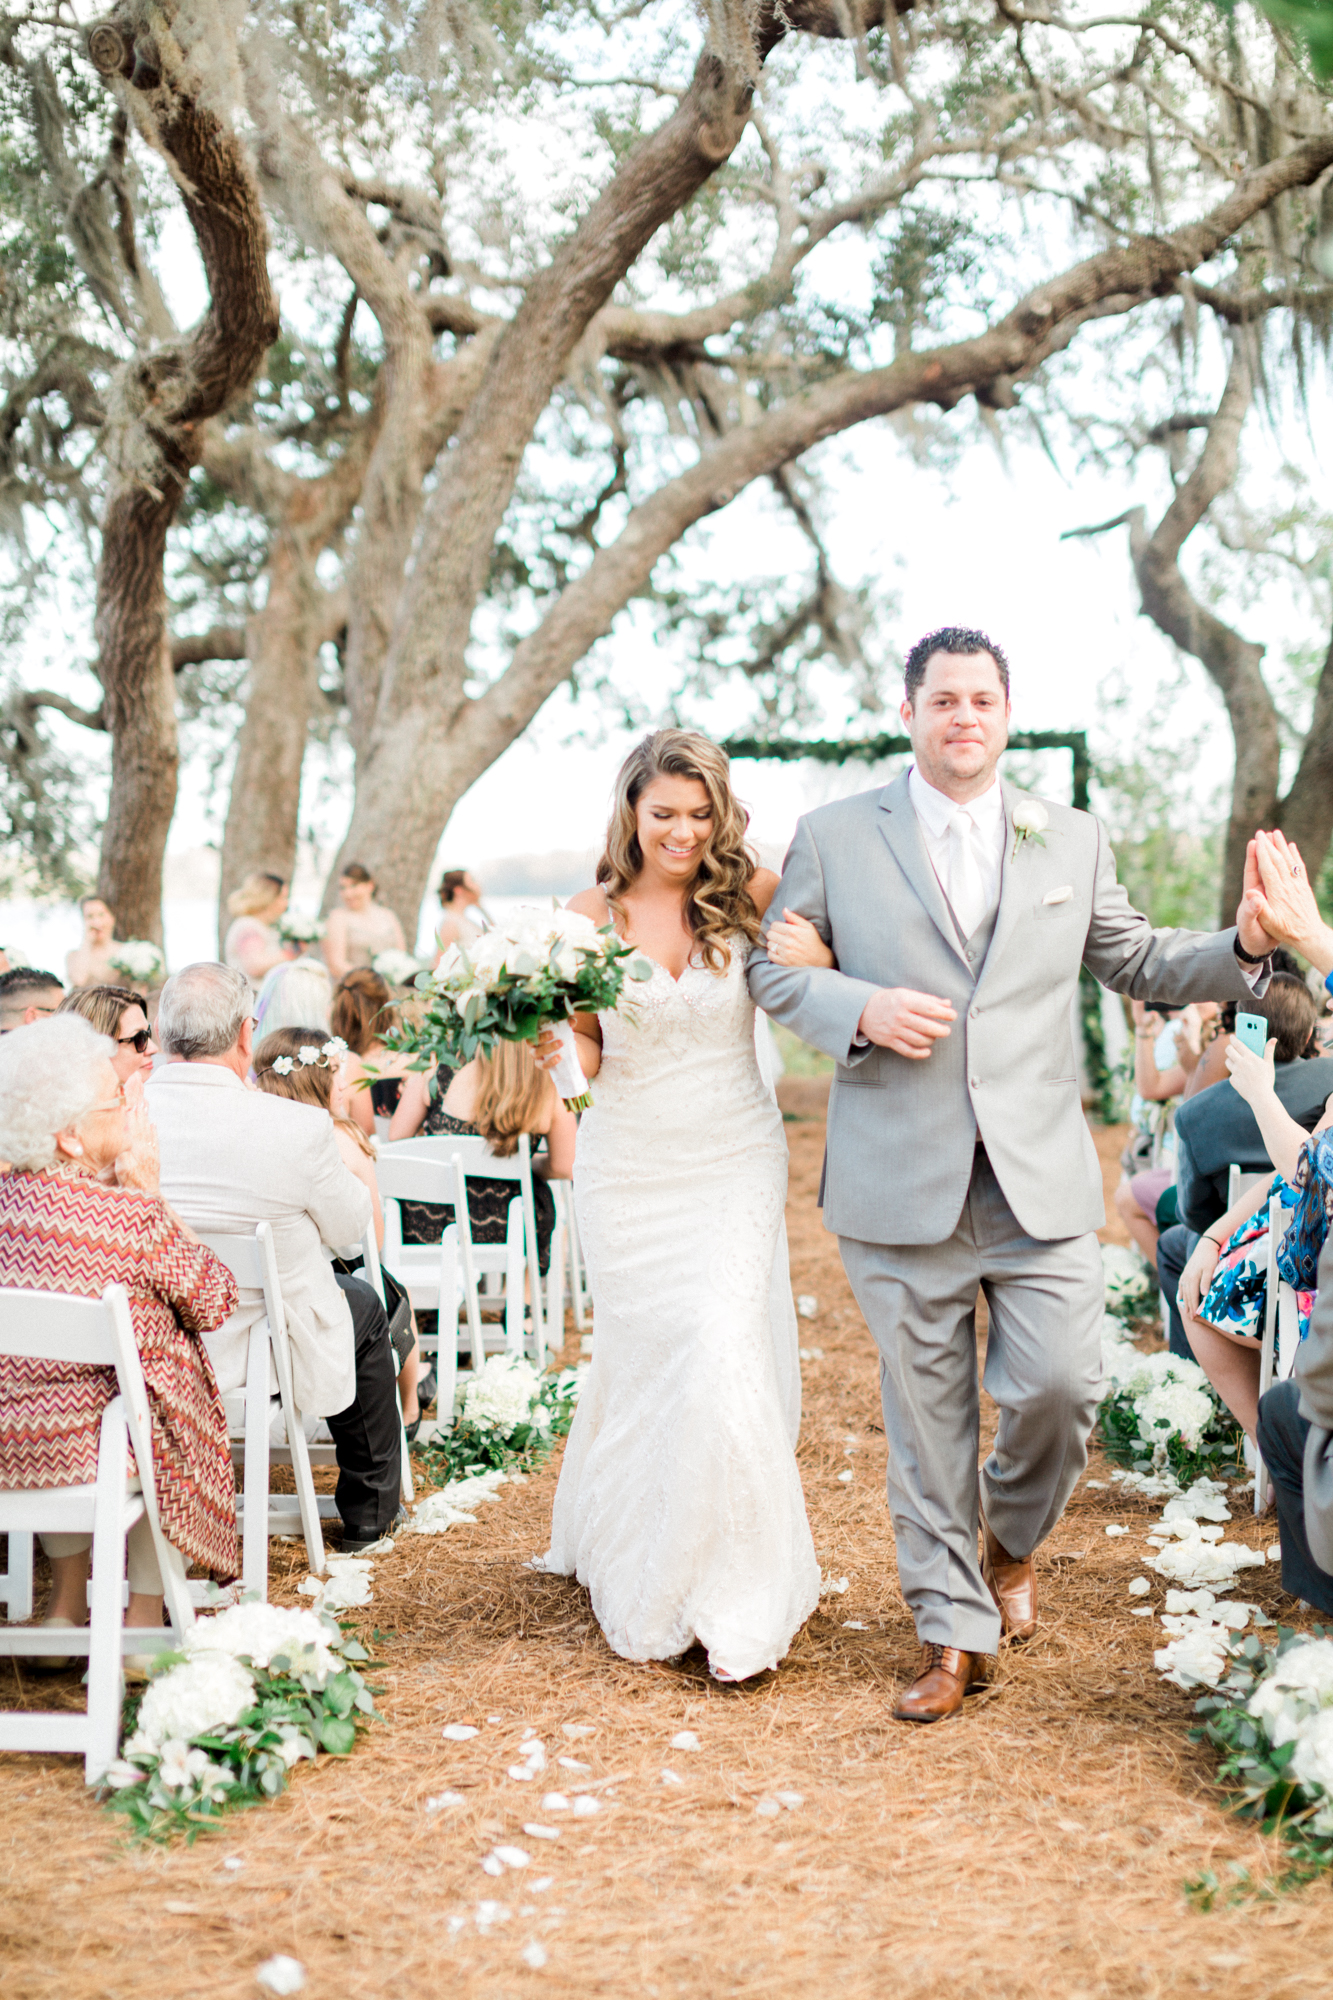 jessica-bellinger-photography-harmony-golf-preserve-wedding-photos-9186.jpg